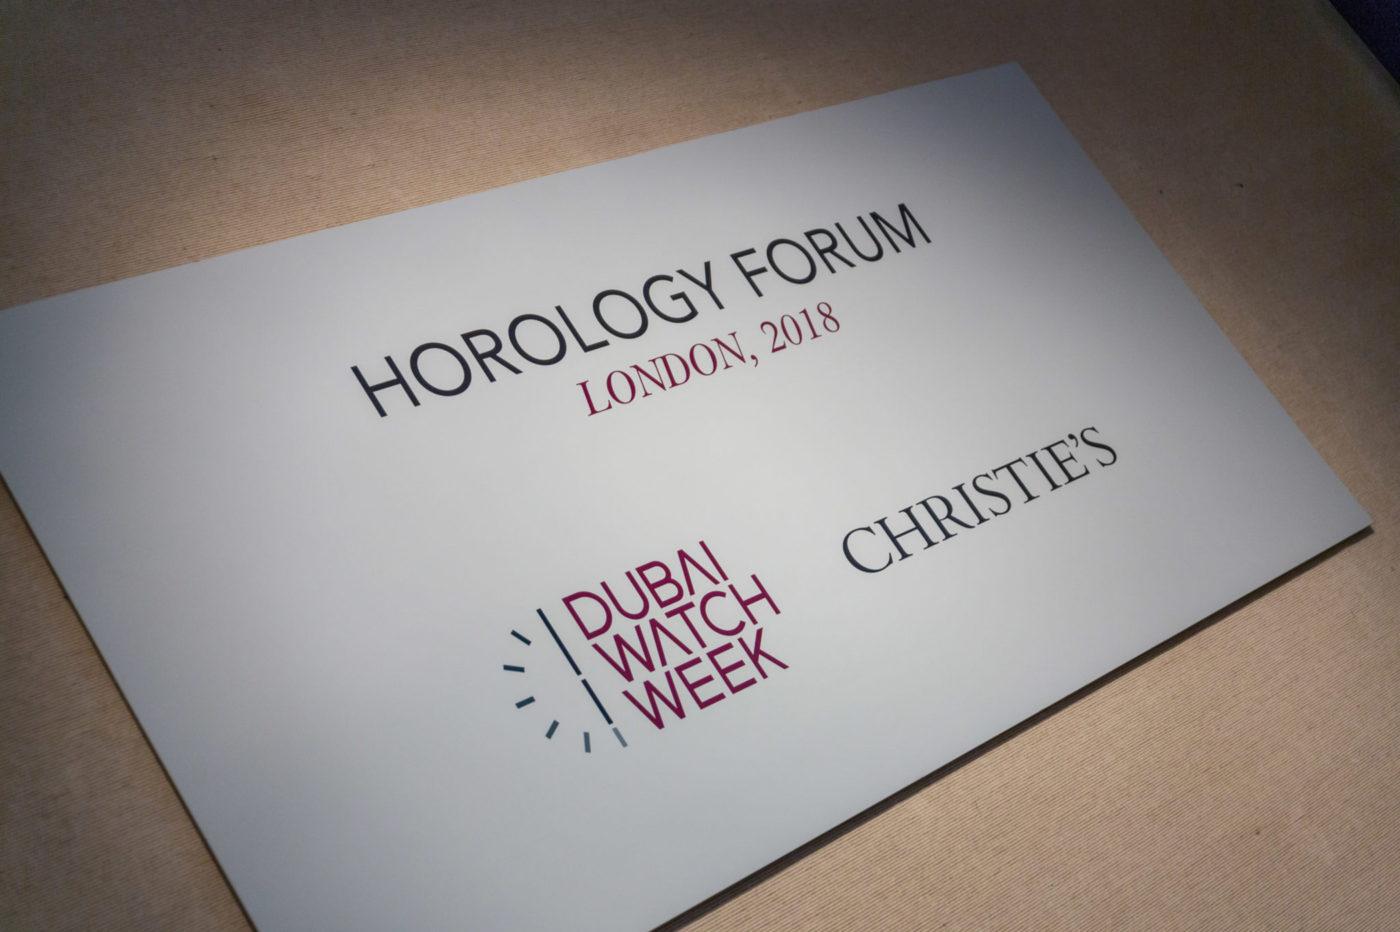 Horology Forum 2018